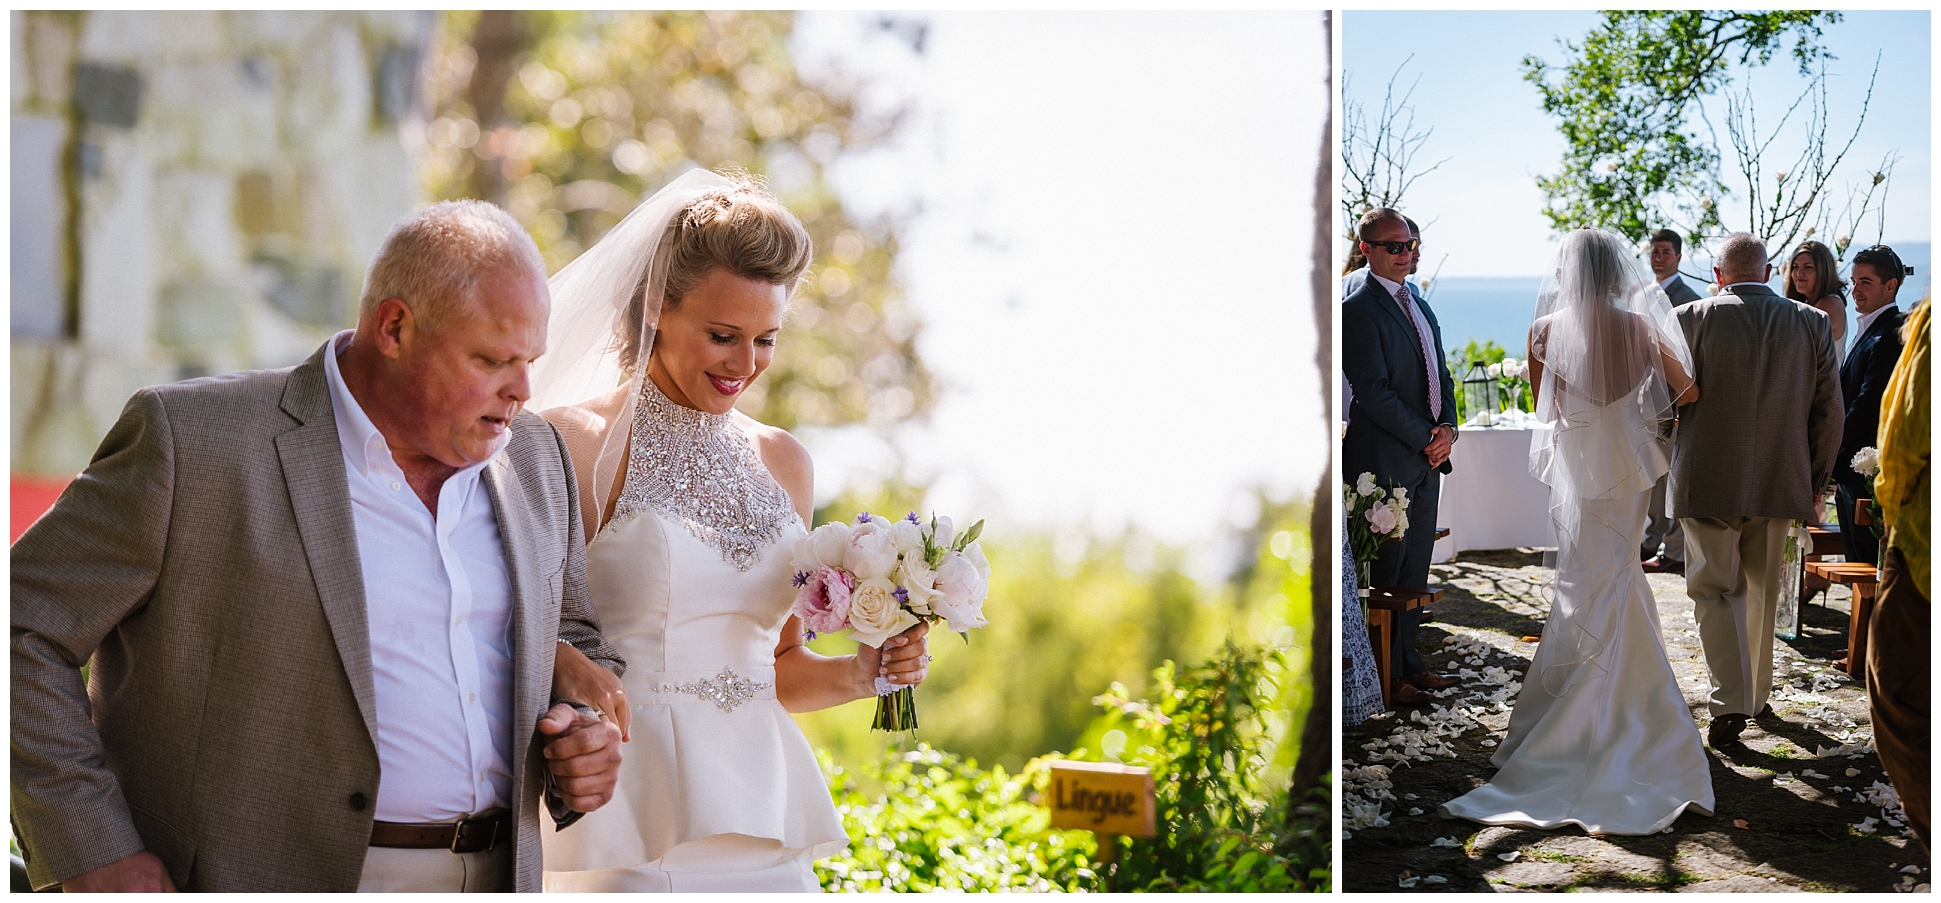 Cheilean-destination-adventure-wedding-florida-patagonia-pucon-santa-cruz-vsco_0093.jpg